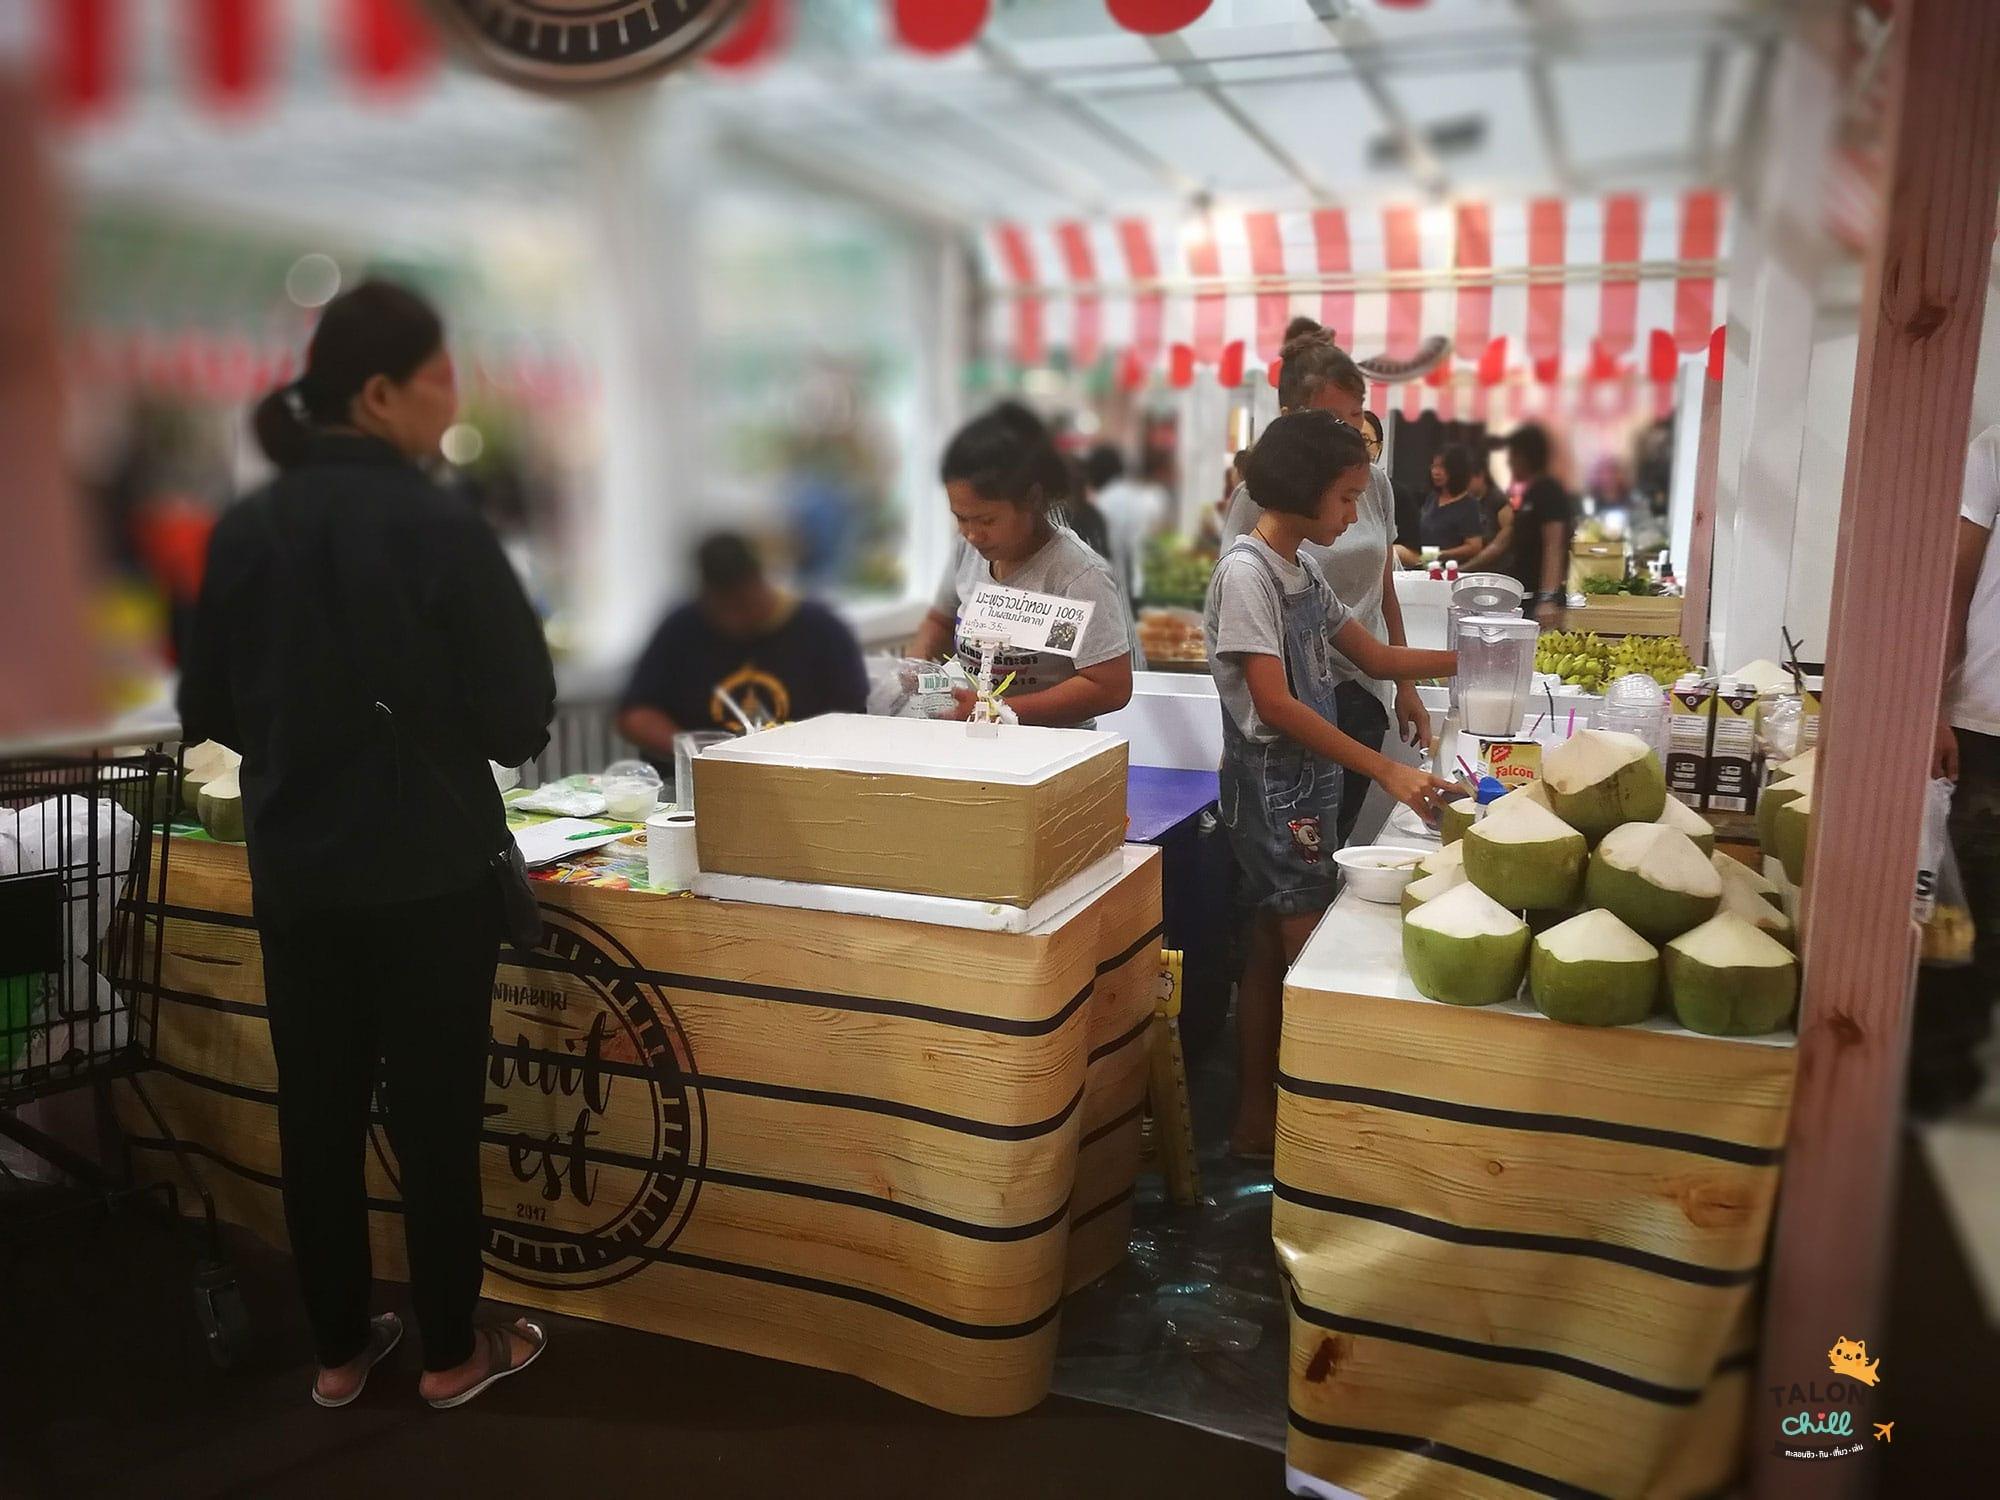 [Review] Nonthaburi Fruit Fest 2017 กระท้อนห่อบางกร่าง และผลไม้ไทย ณ CentralPlaza Rattanathibet